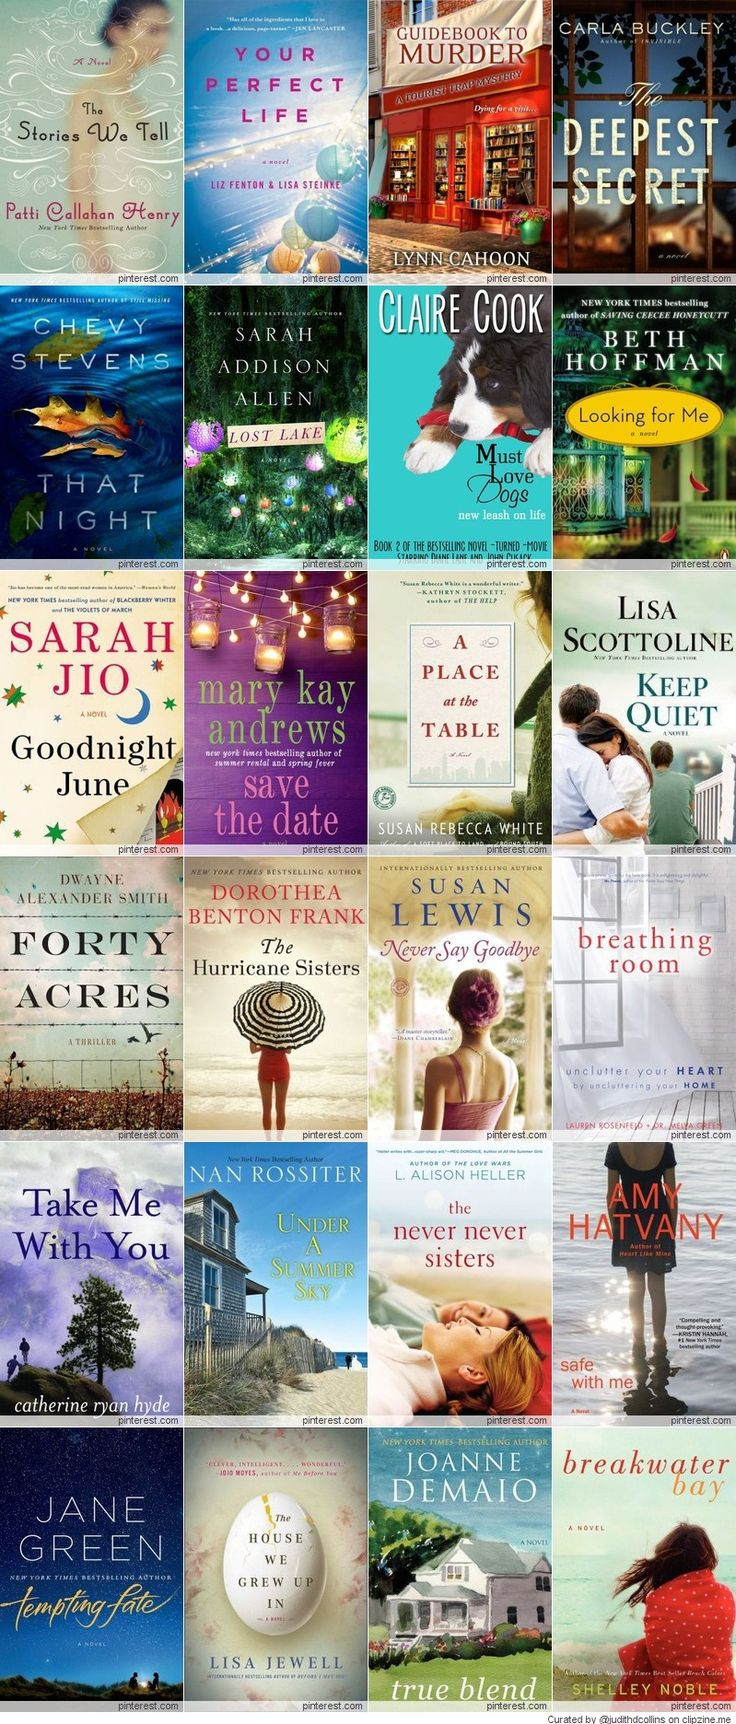 2014 Must Read Books. For more book fun, follow us on Pinterest :  www.pinterest.com/booktasticfun AND on Facebook :  www.facebook.com/booktasticfun